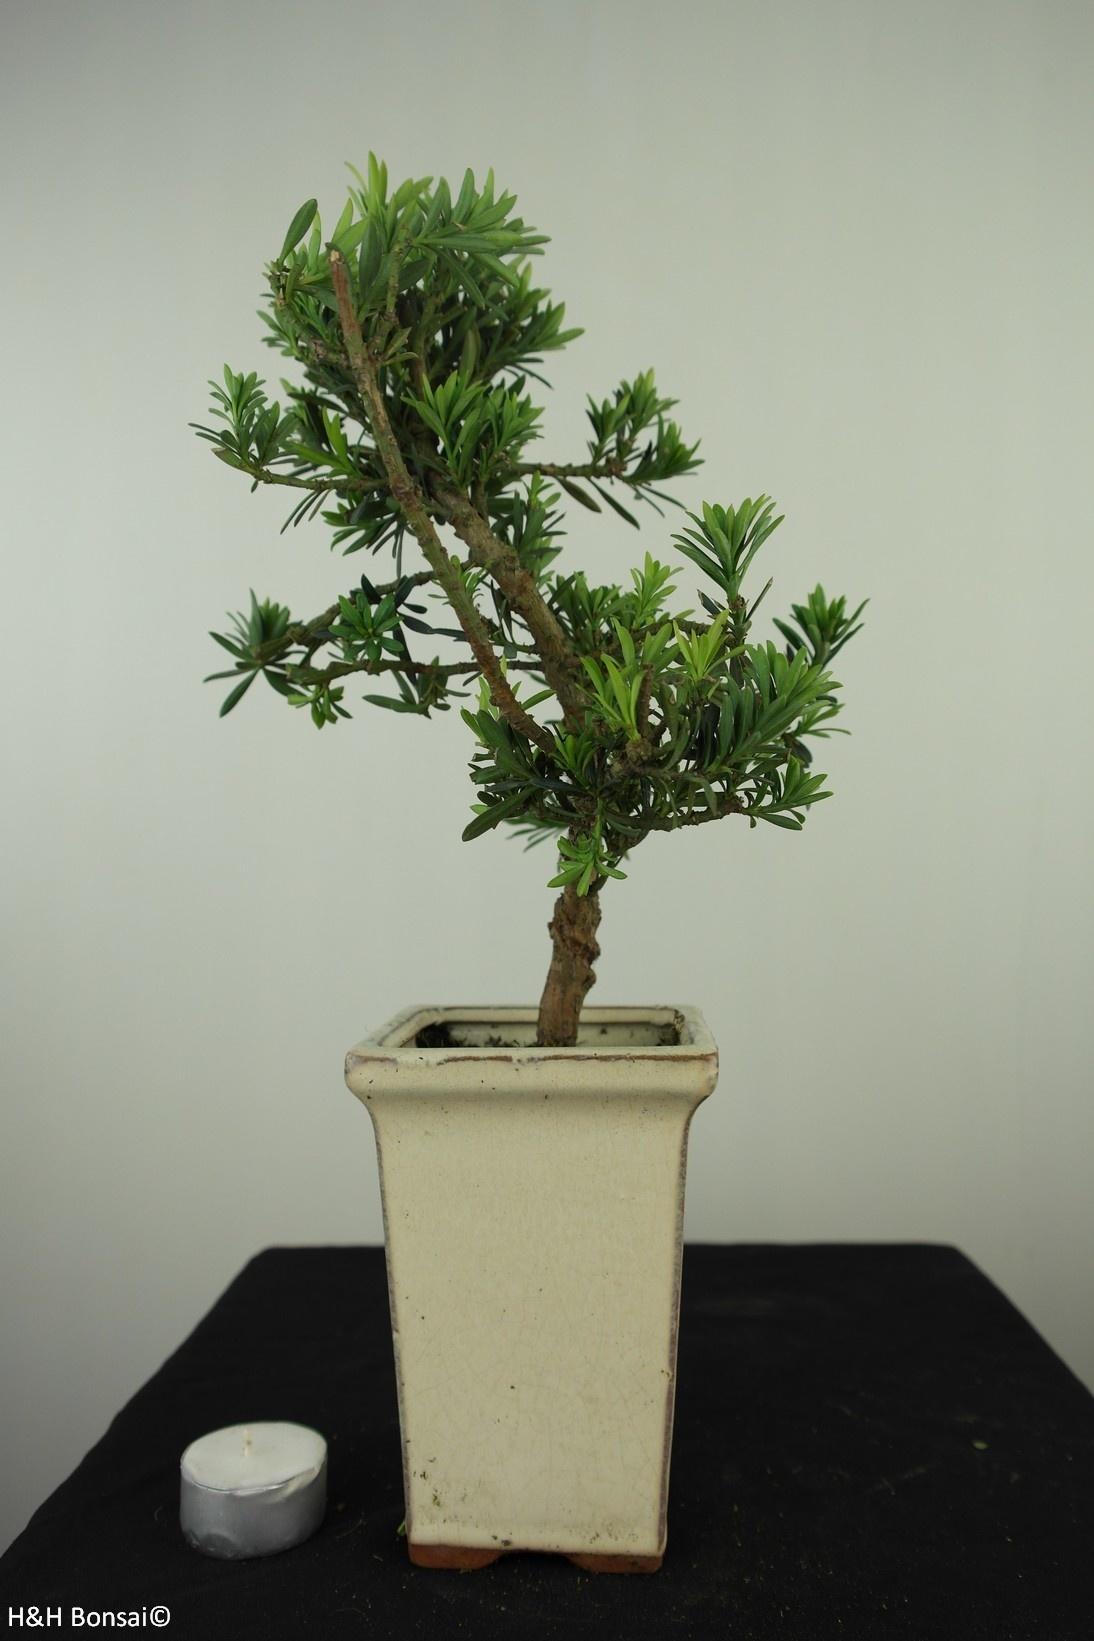 Bonsai Buddhist Pine, Podocarpus, no. 7597